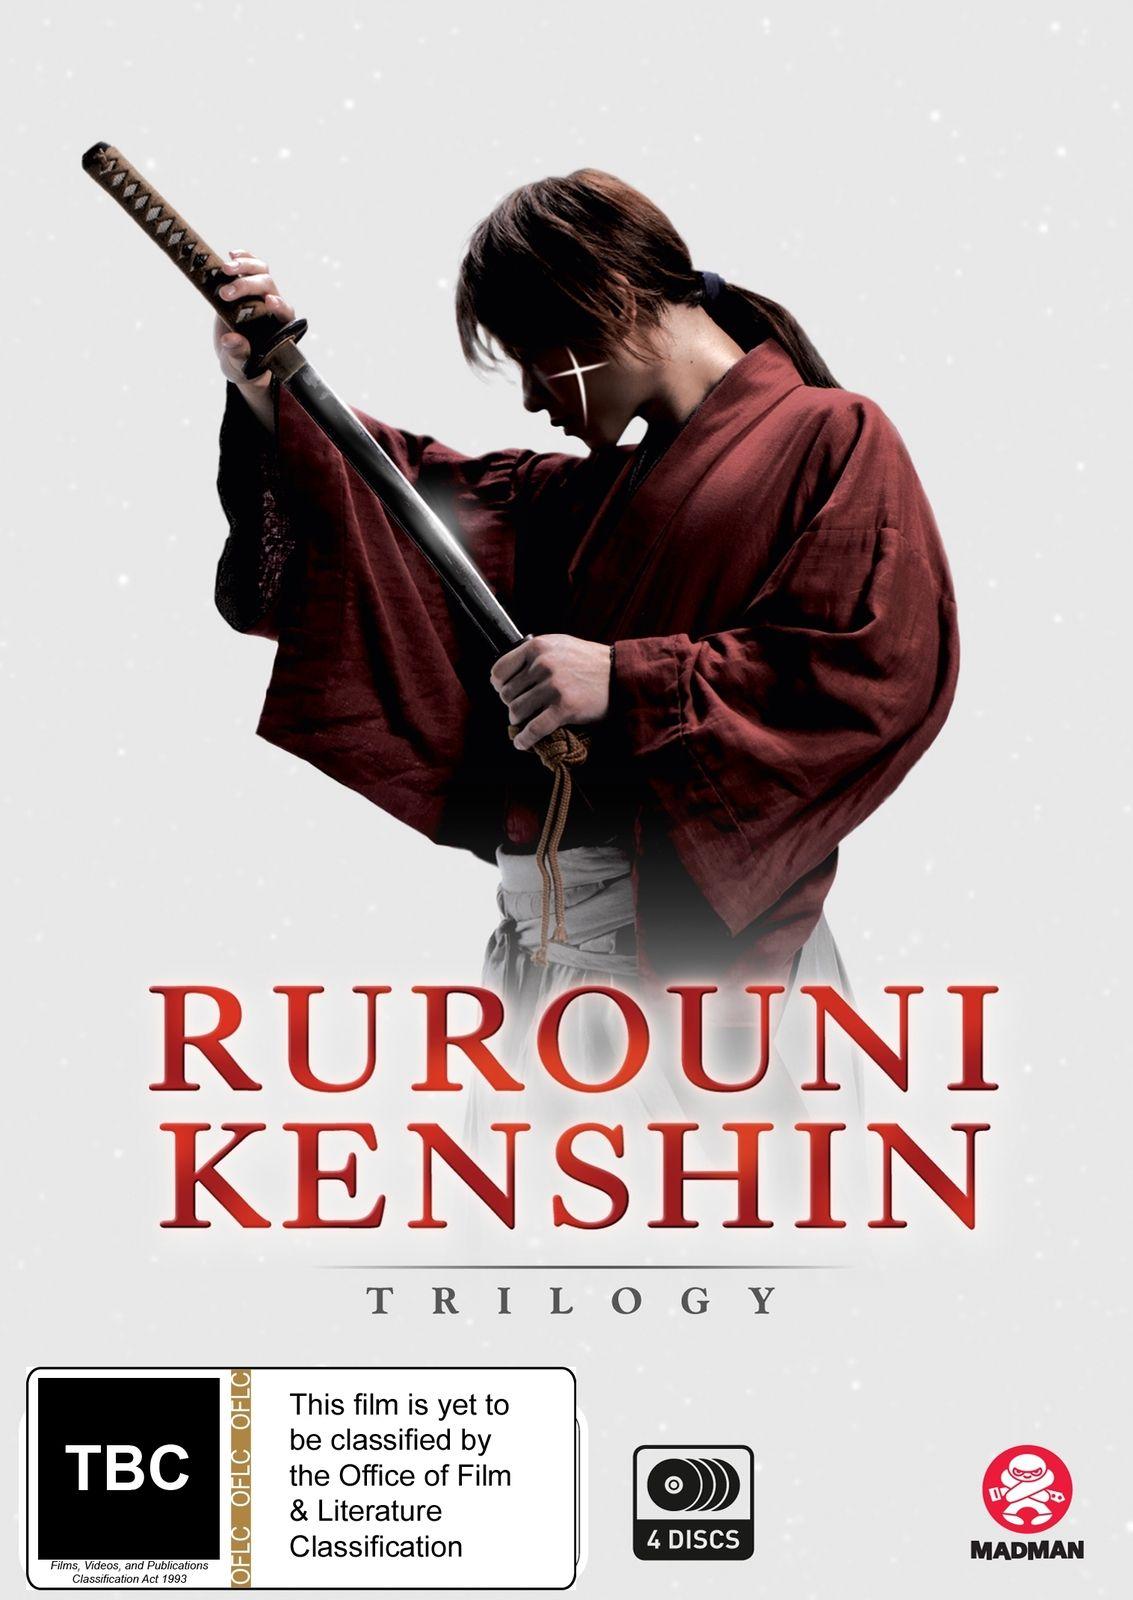 Rurouni Kenshin Trilogy DVD【2020】 佐藤健, るろうに剣心, るろうに